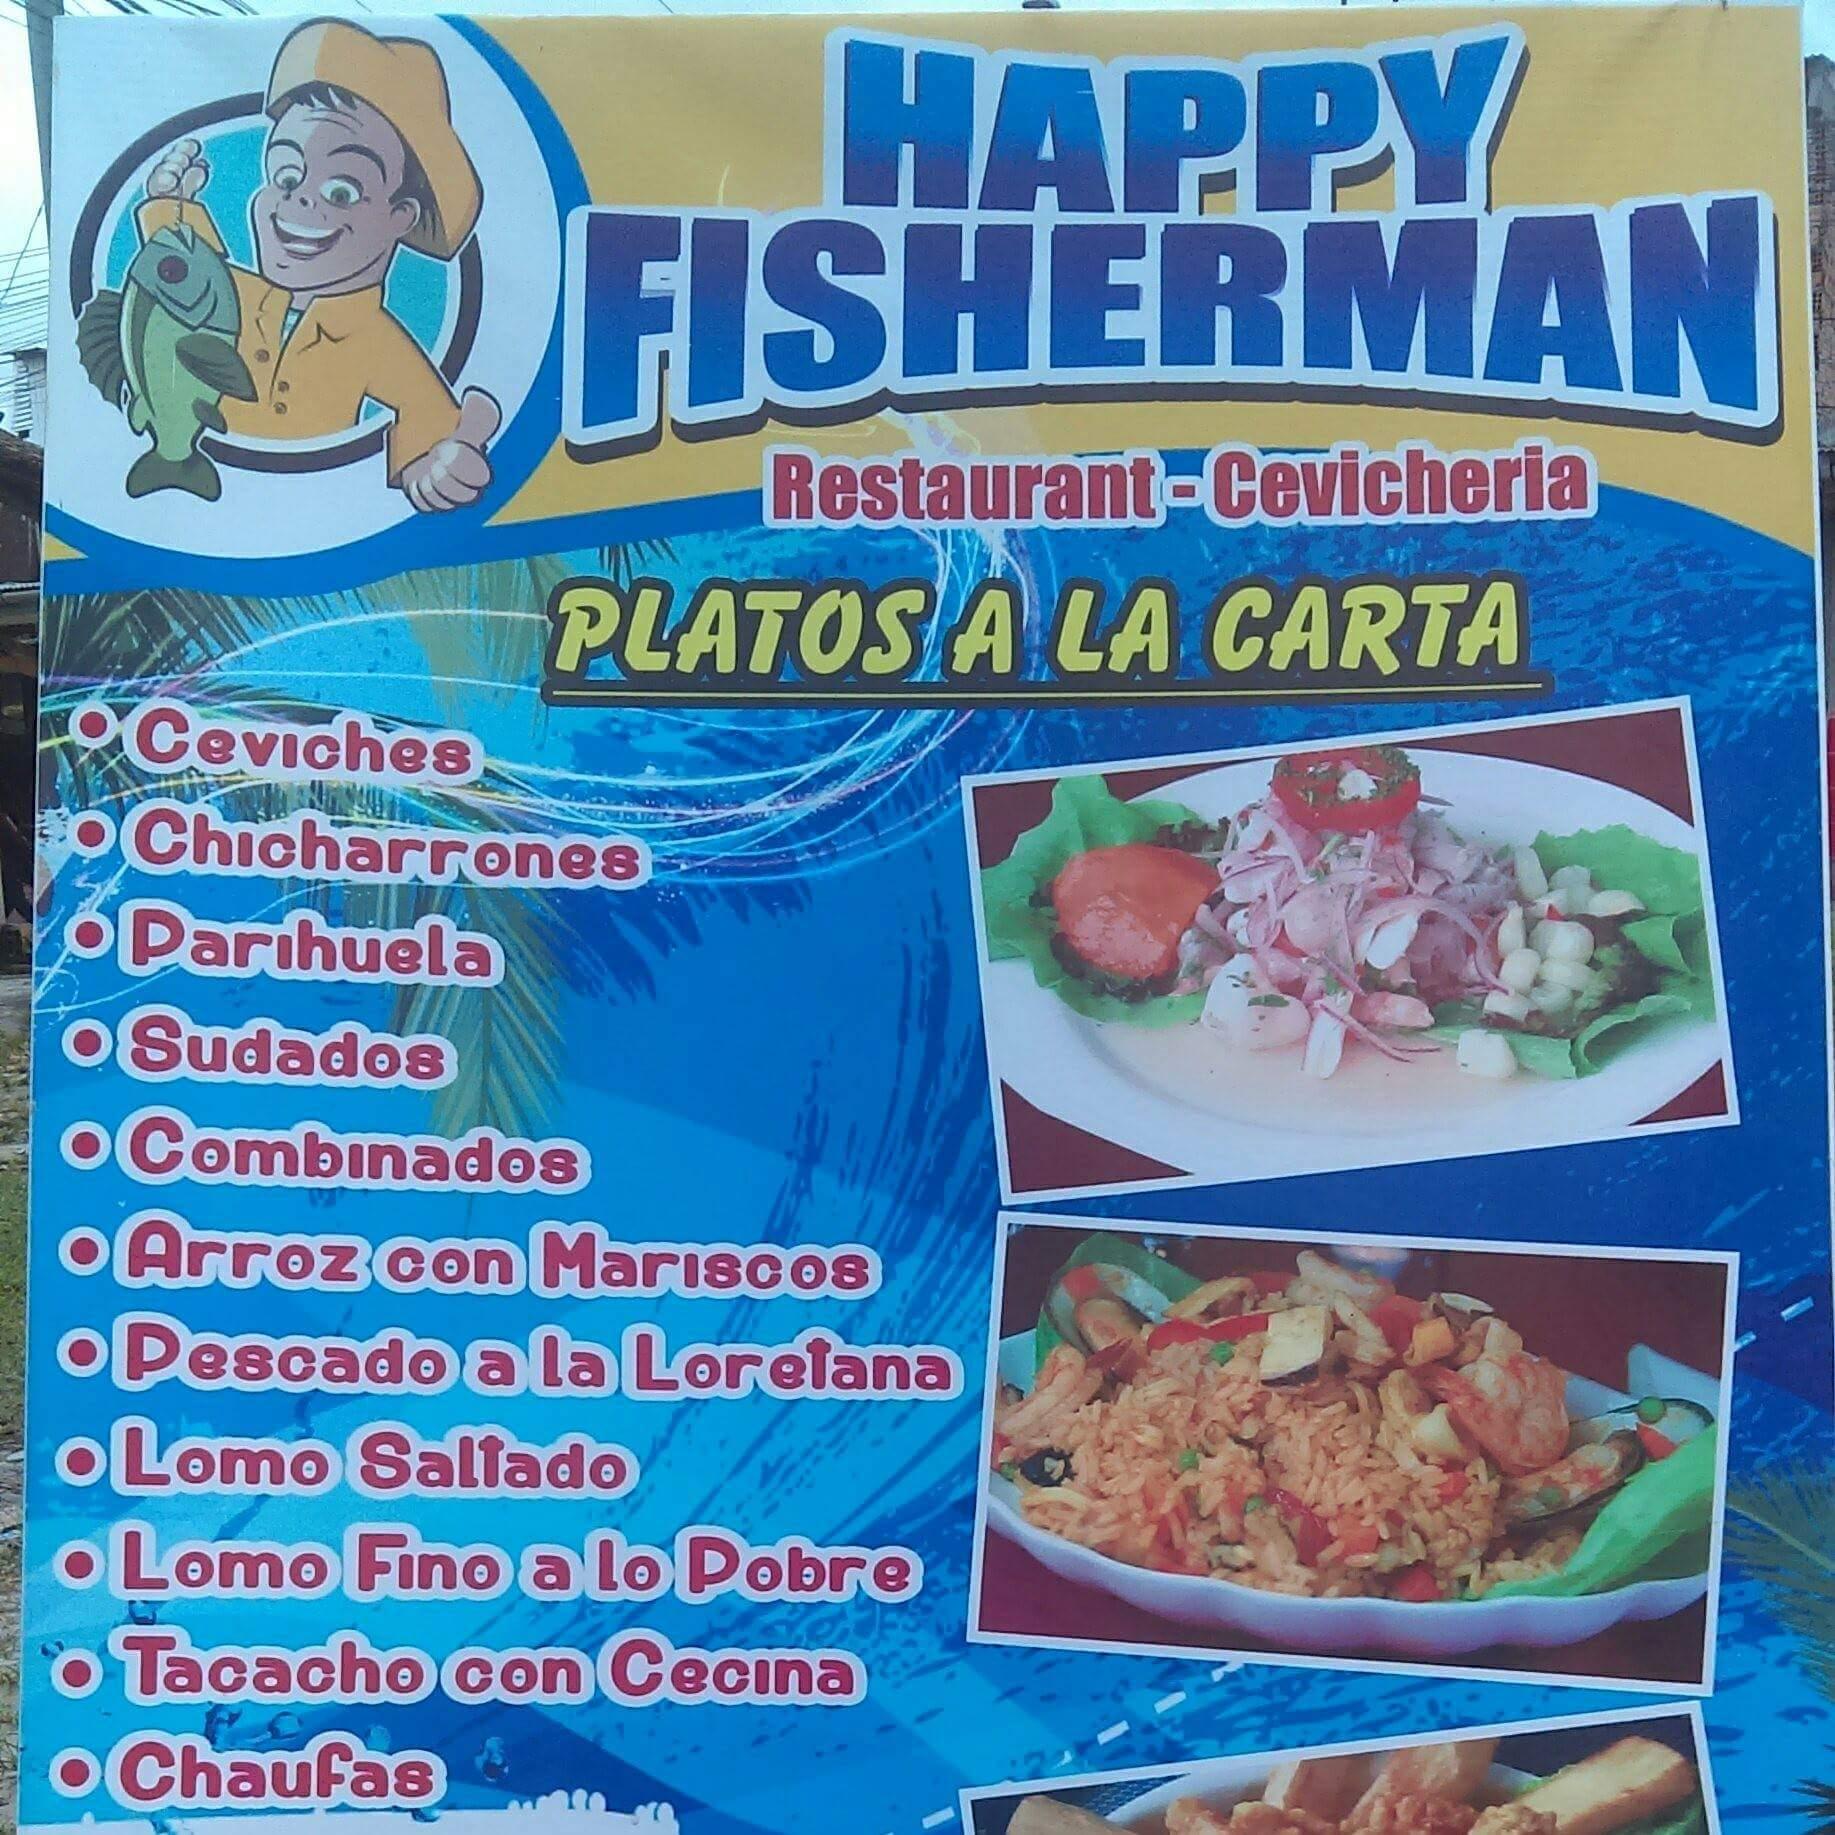 Restaurant Cevicheria Happy Fisherman